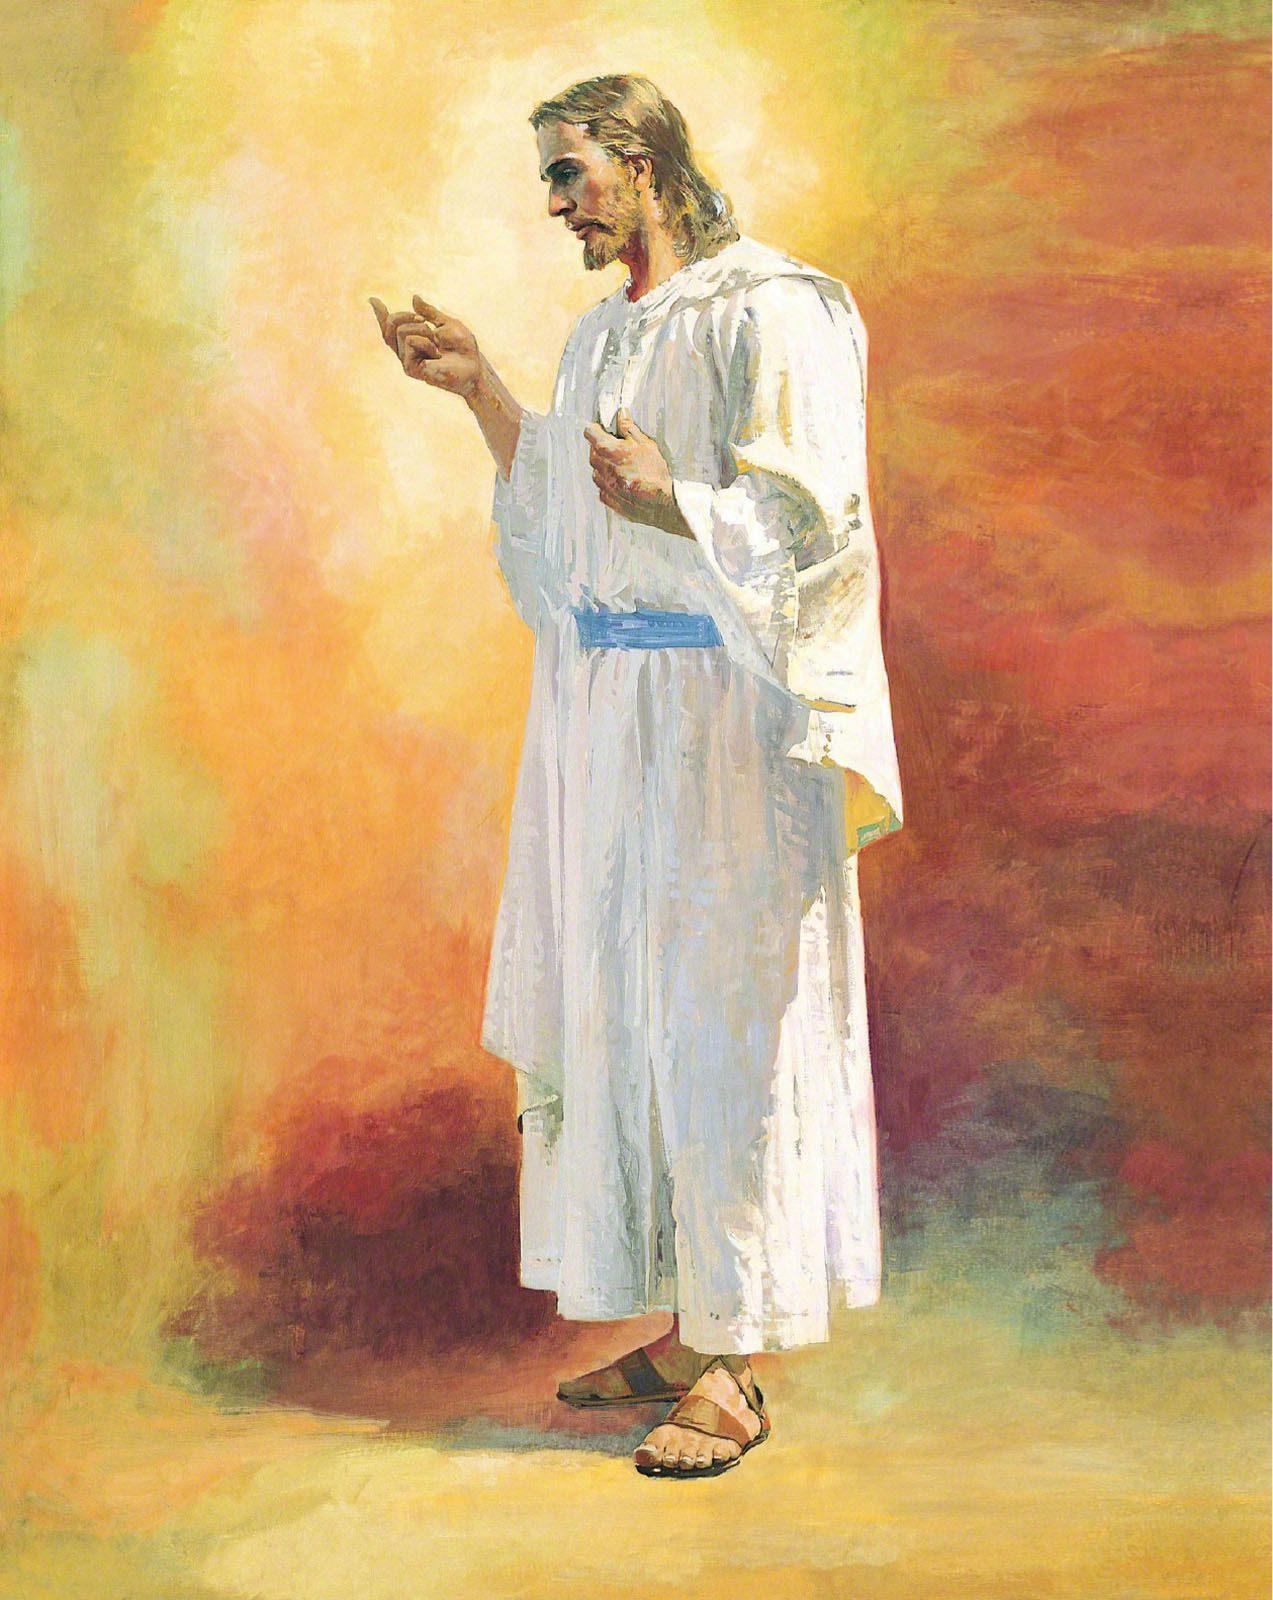 jesus-christ-harry-anderson